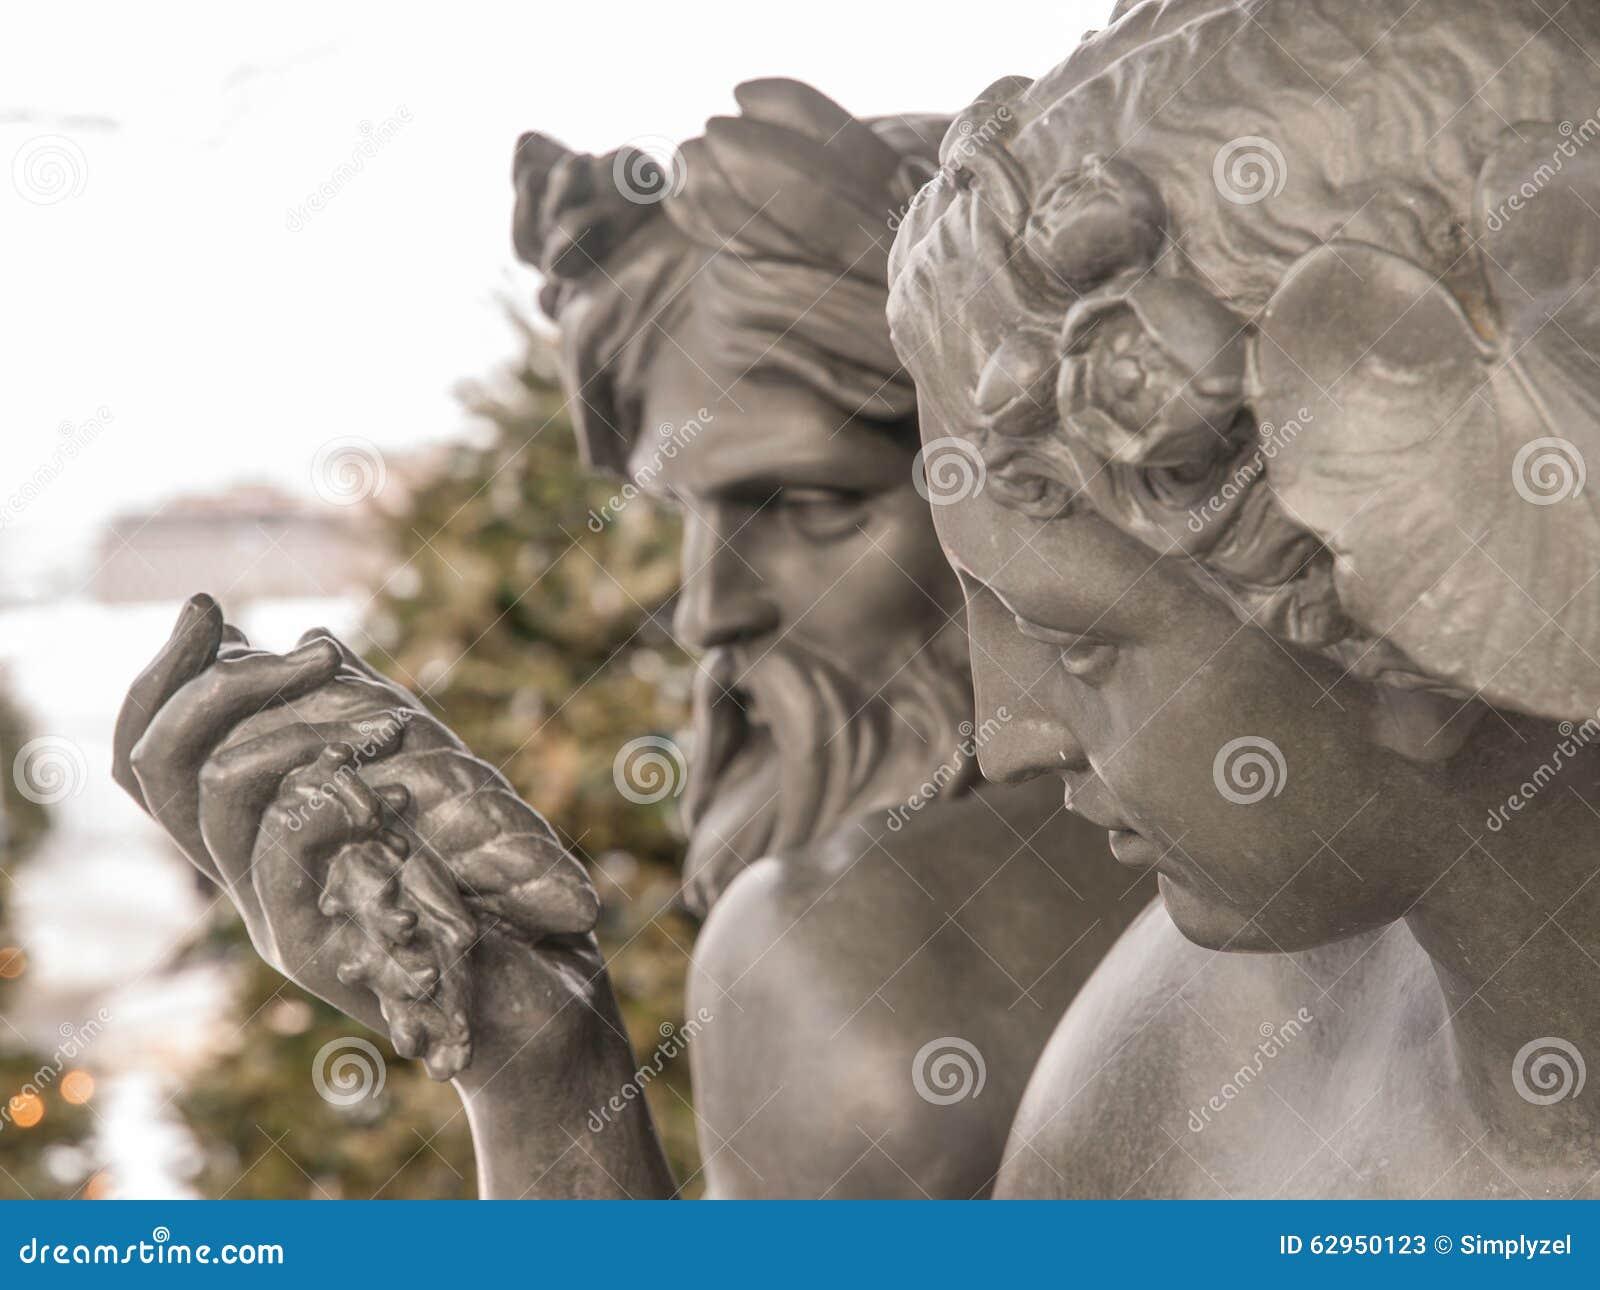 God and goddess statue stock photo image 62950123 - God and goddess statues ...